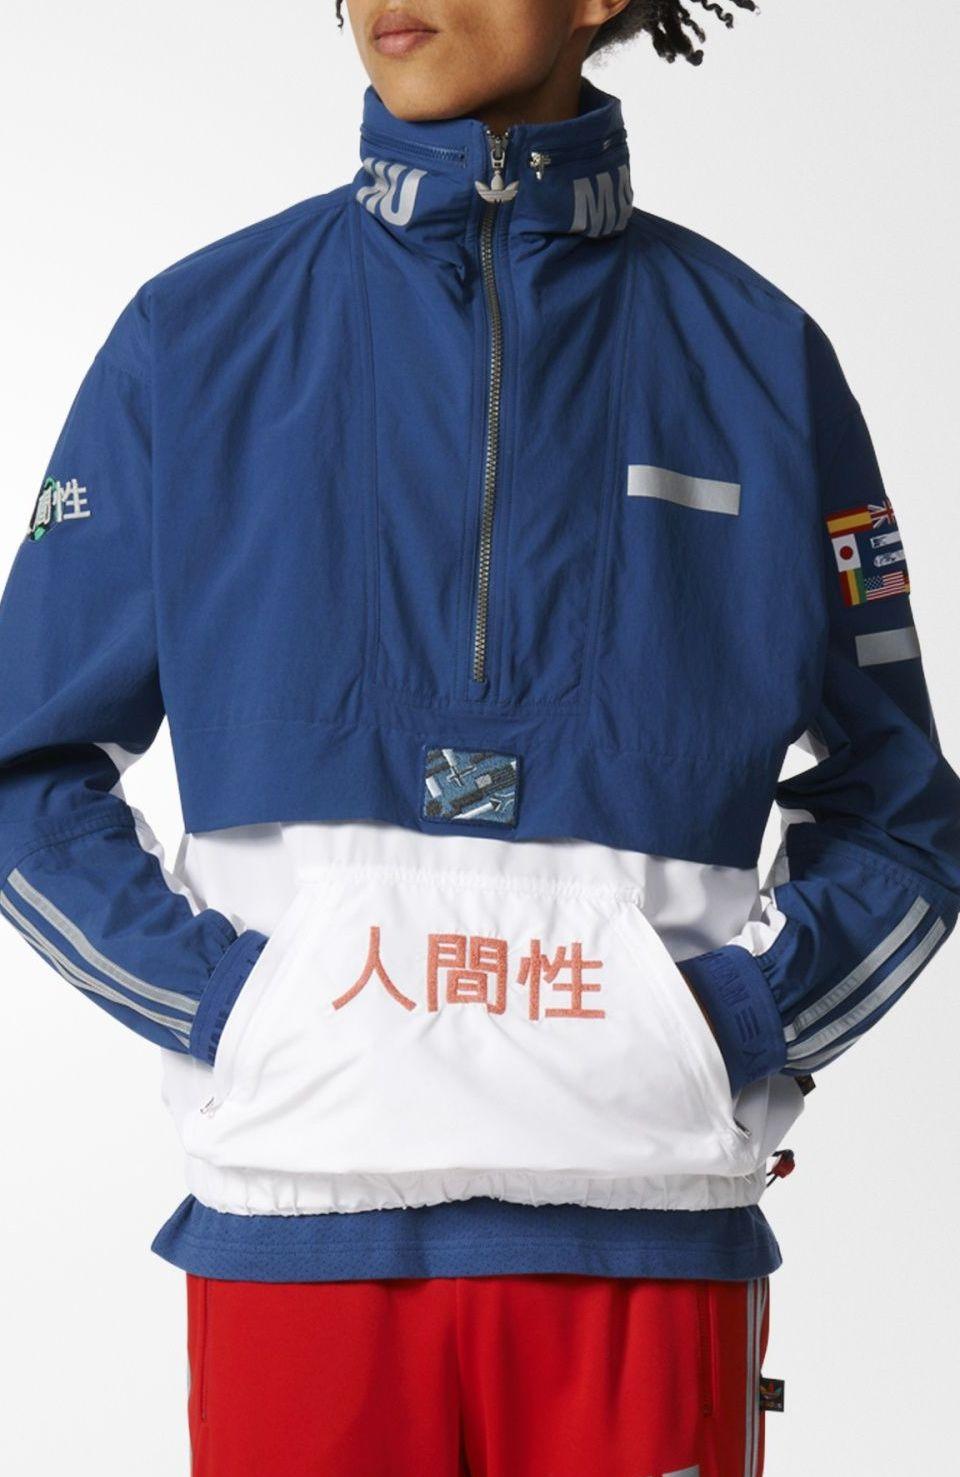 39f3e351fc390 PHARRELL WILLIAMS HUMAN RACE WINDBREAKER (via adidas US)